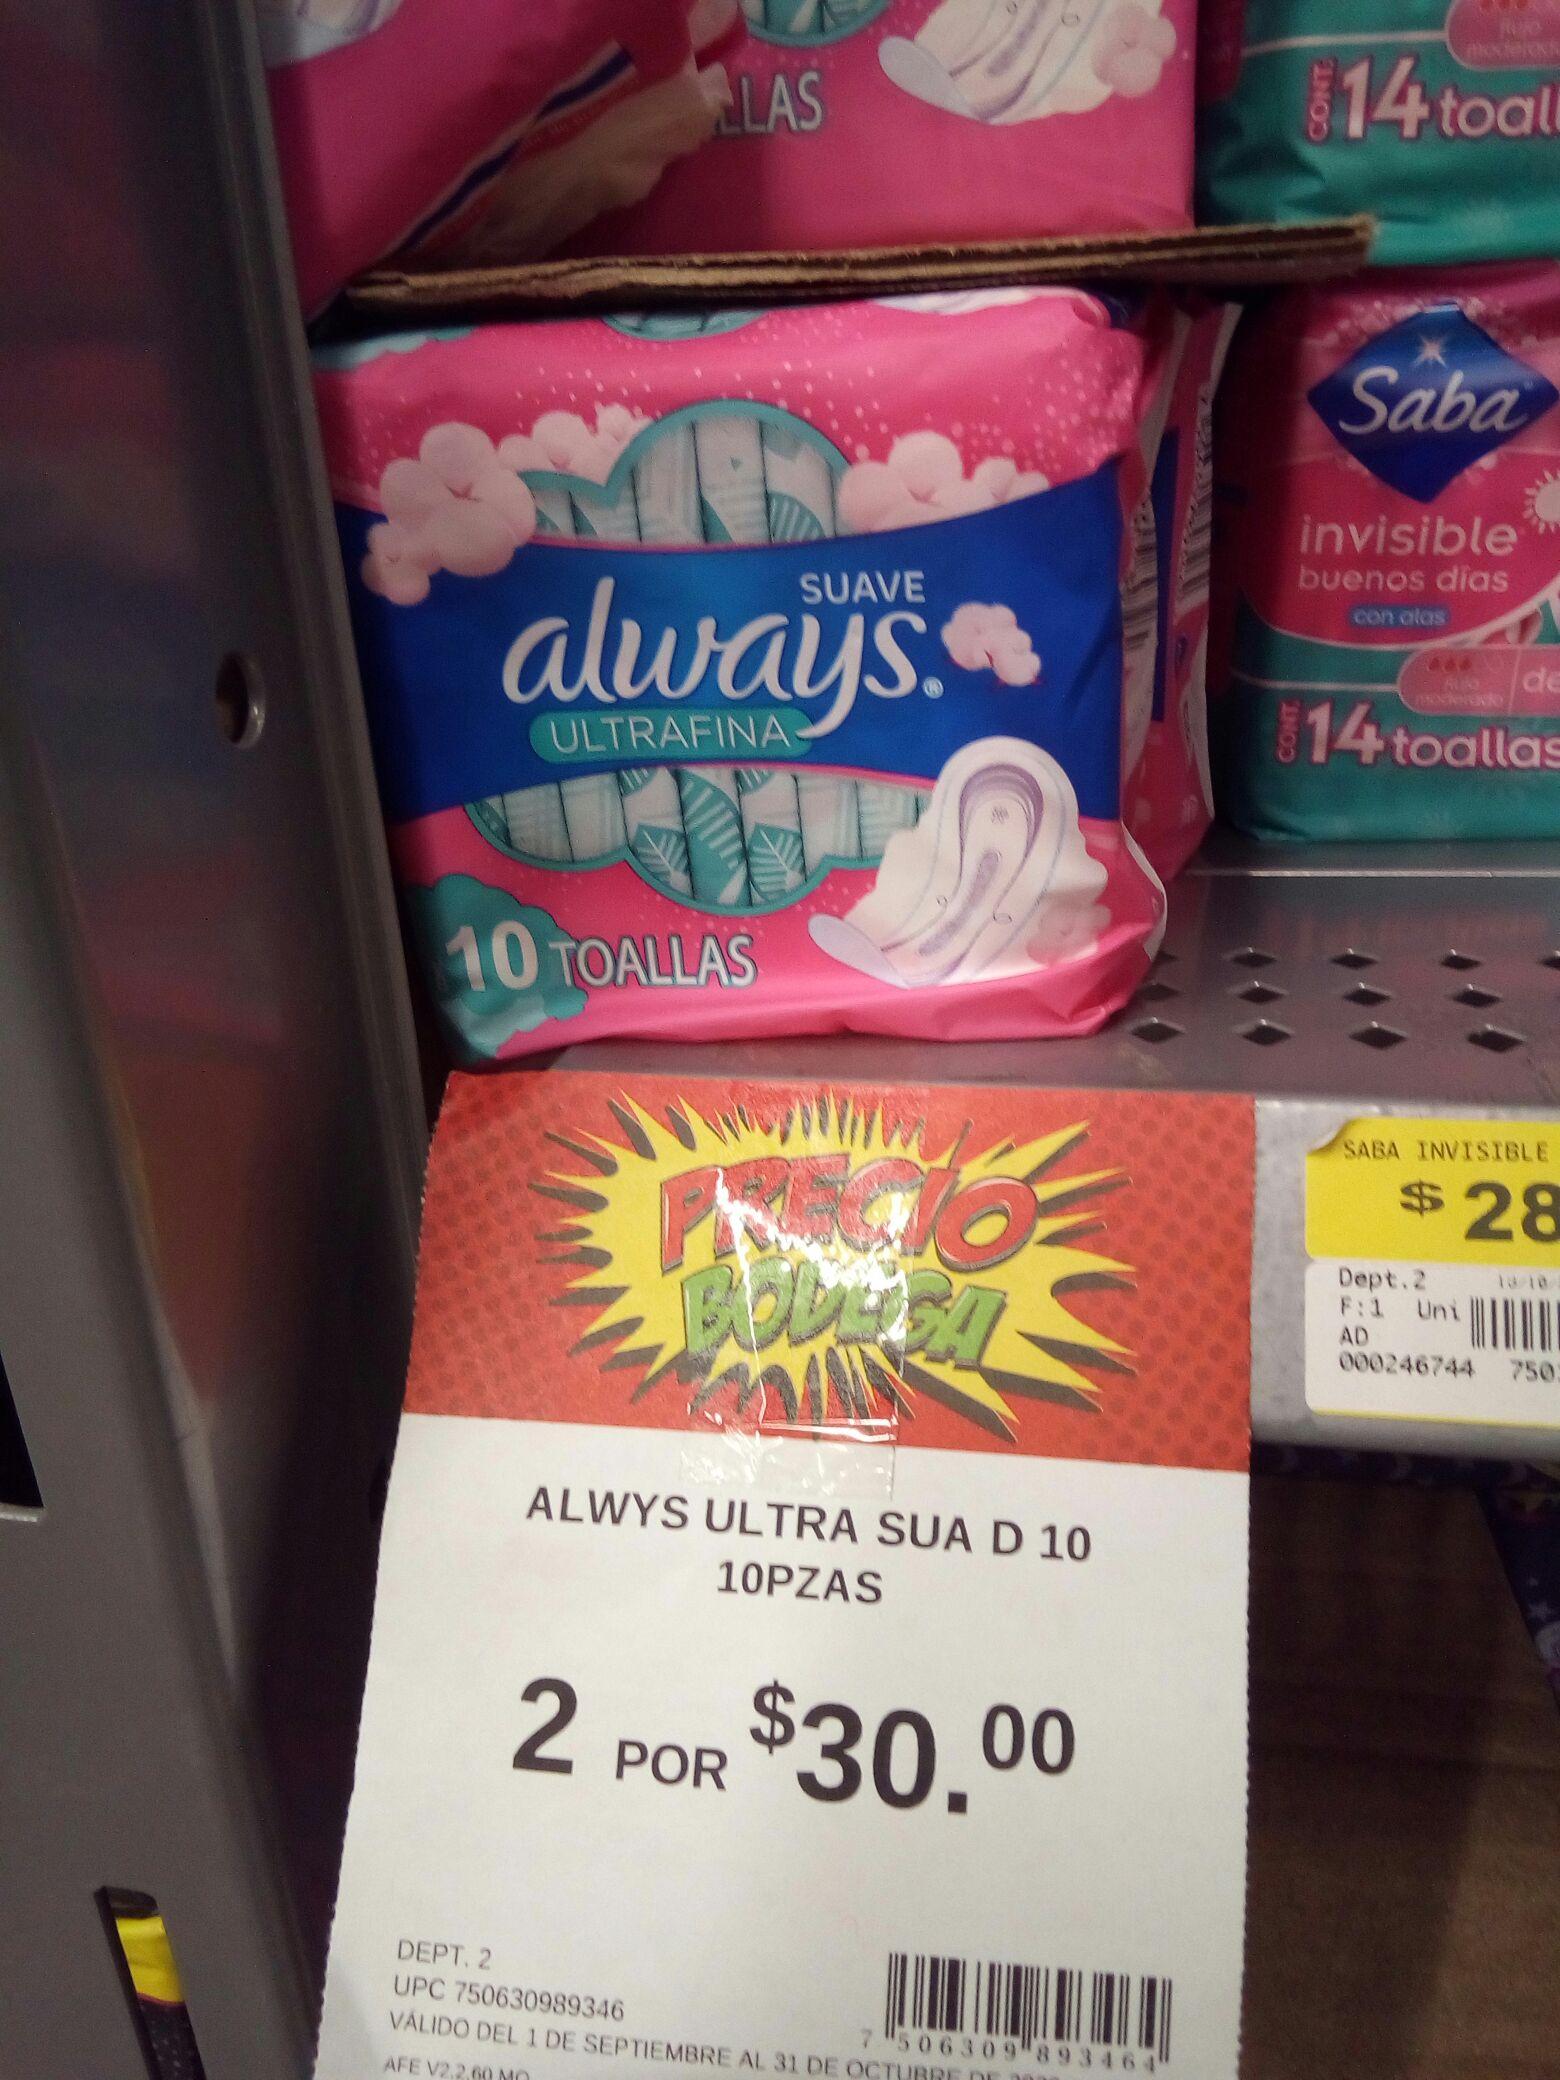 Bodega aurrerá Huajuapan: toallas sanitarias always, 2 paquetes de 10 pzs.